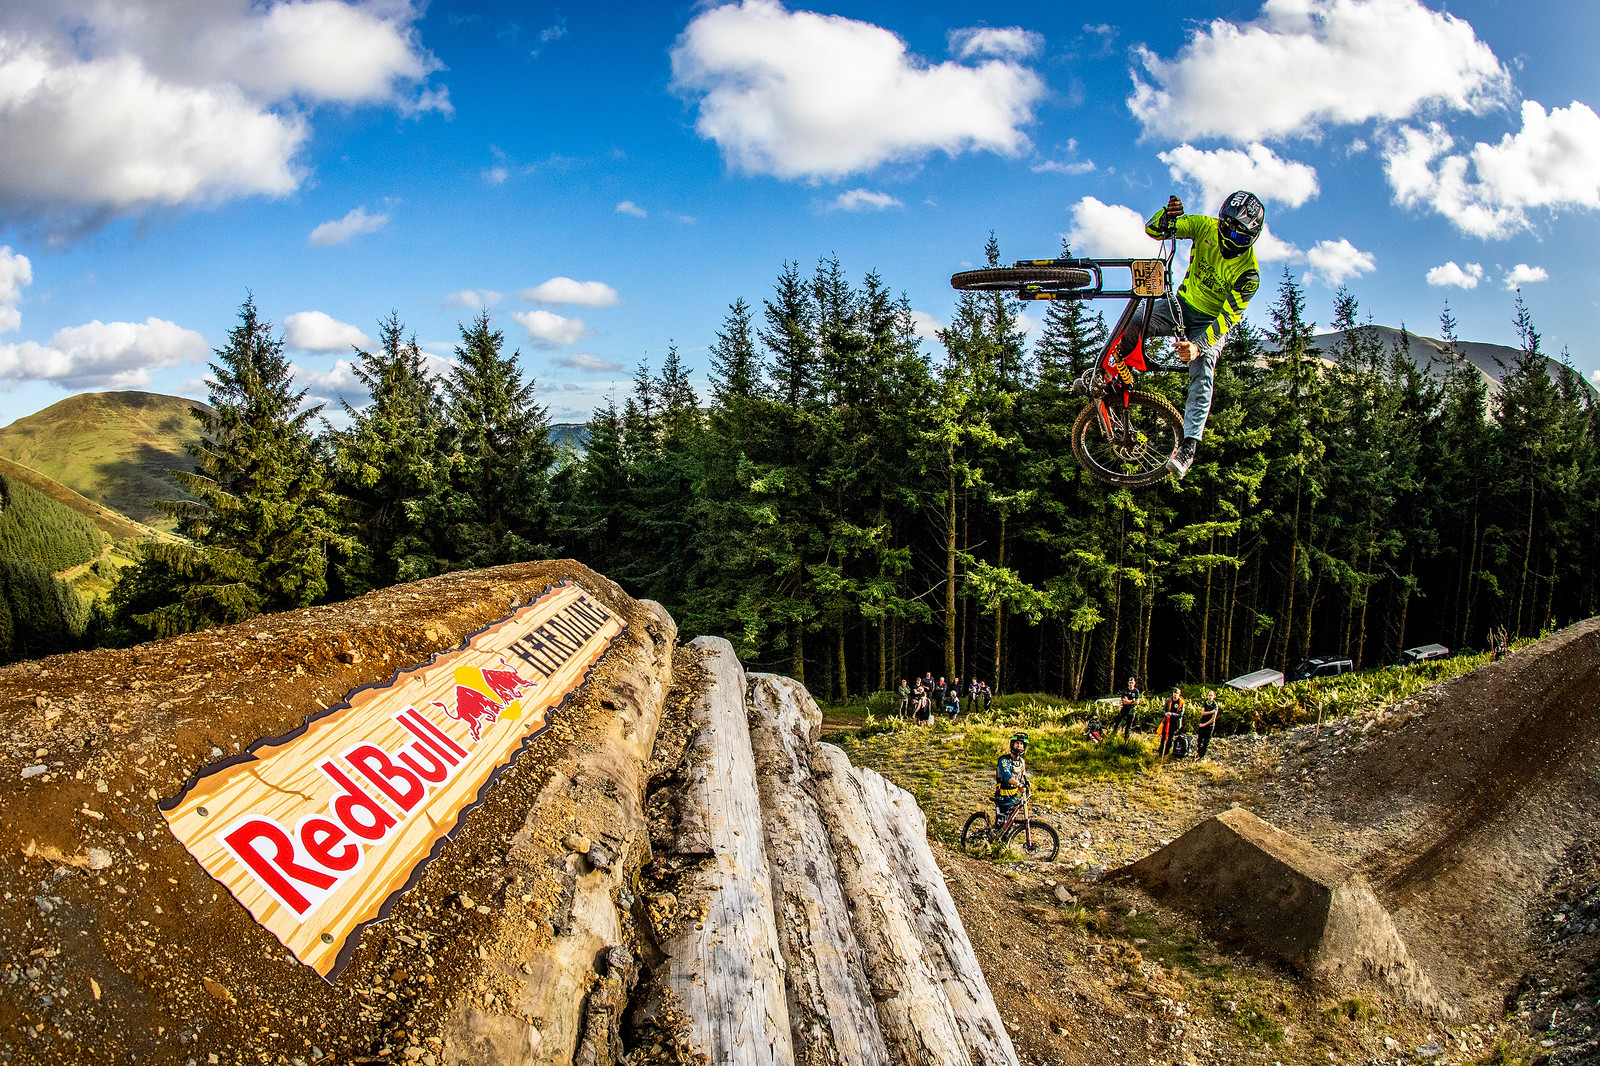 Dave The Dangler McMillan - BIG AIR PHOTO BLAST - RED BULL HARDLINE - Mountain Biking Pictures - Vital MTB